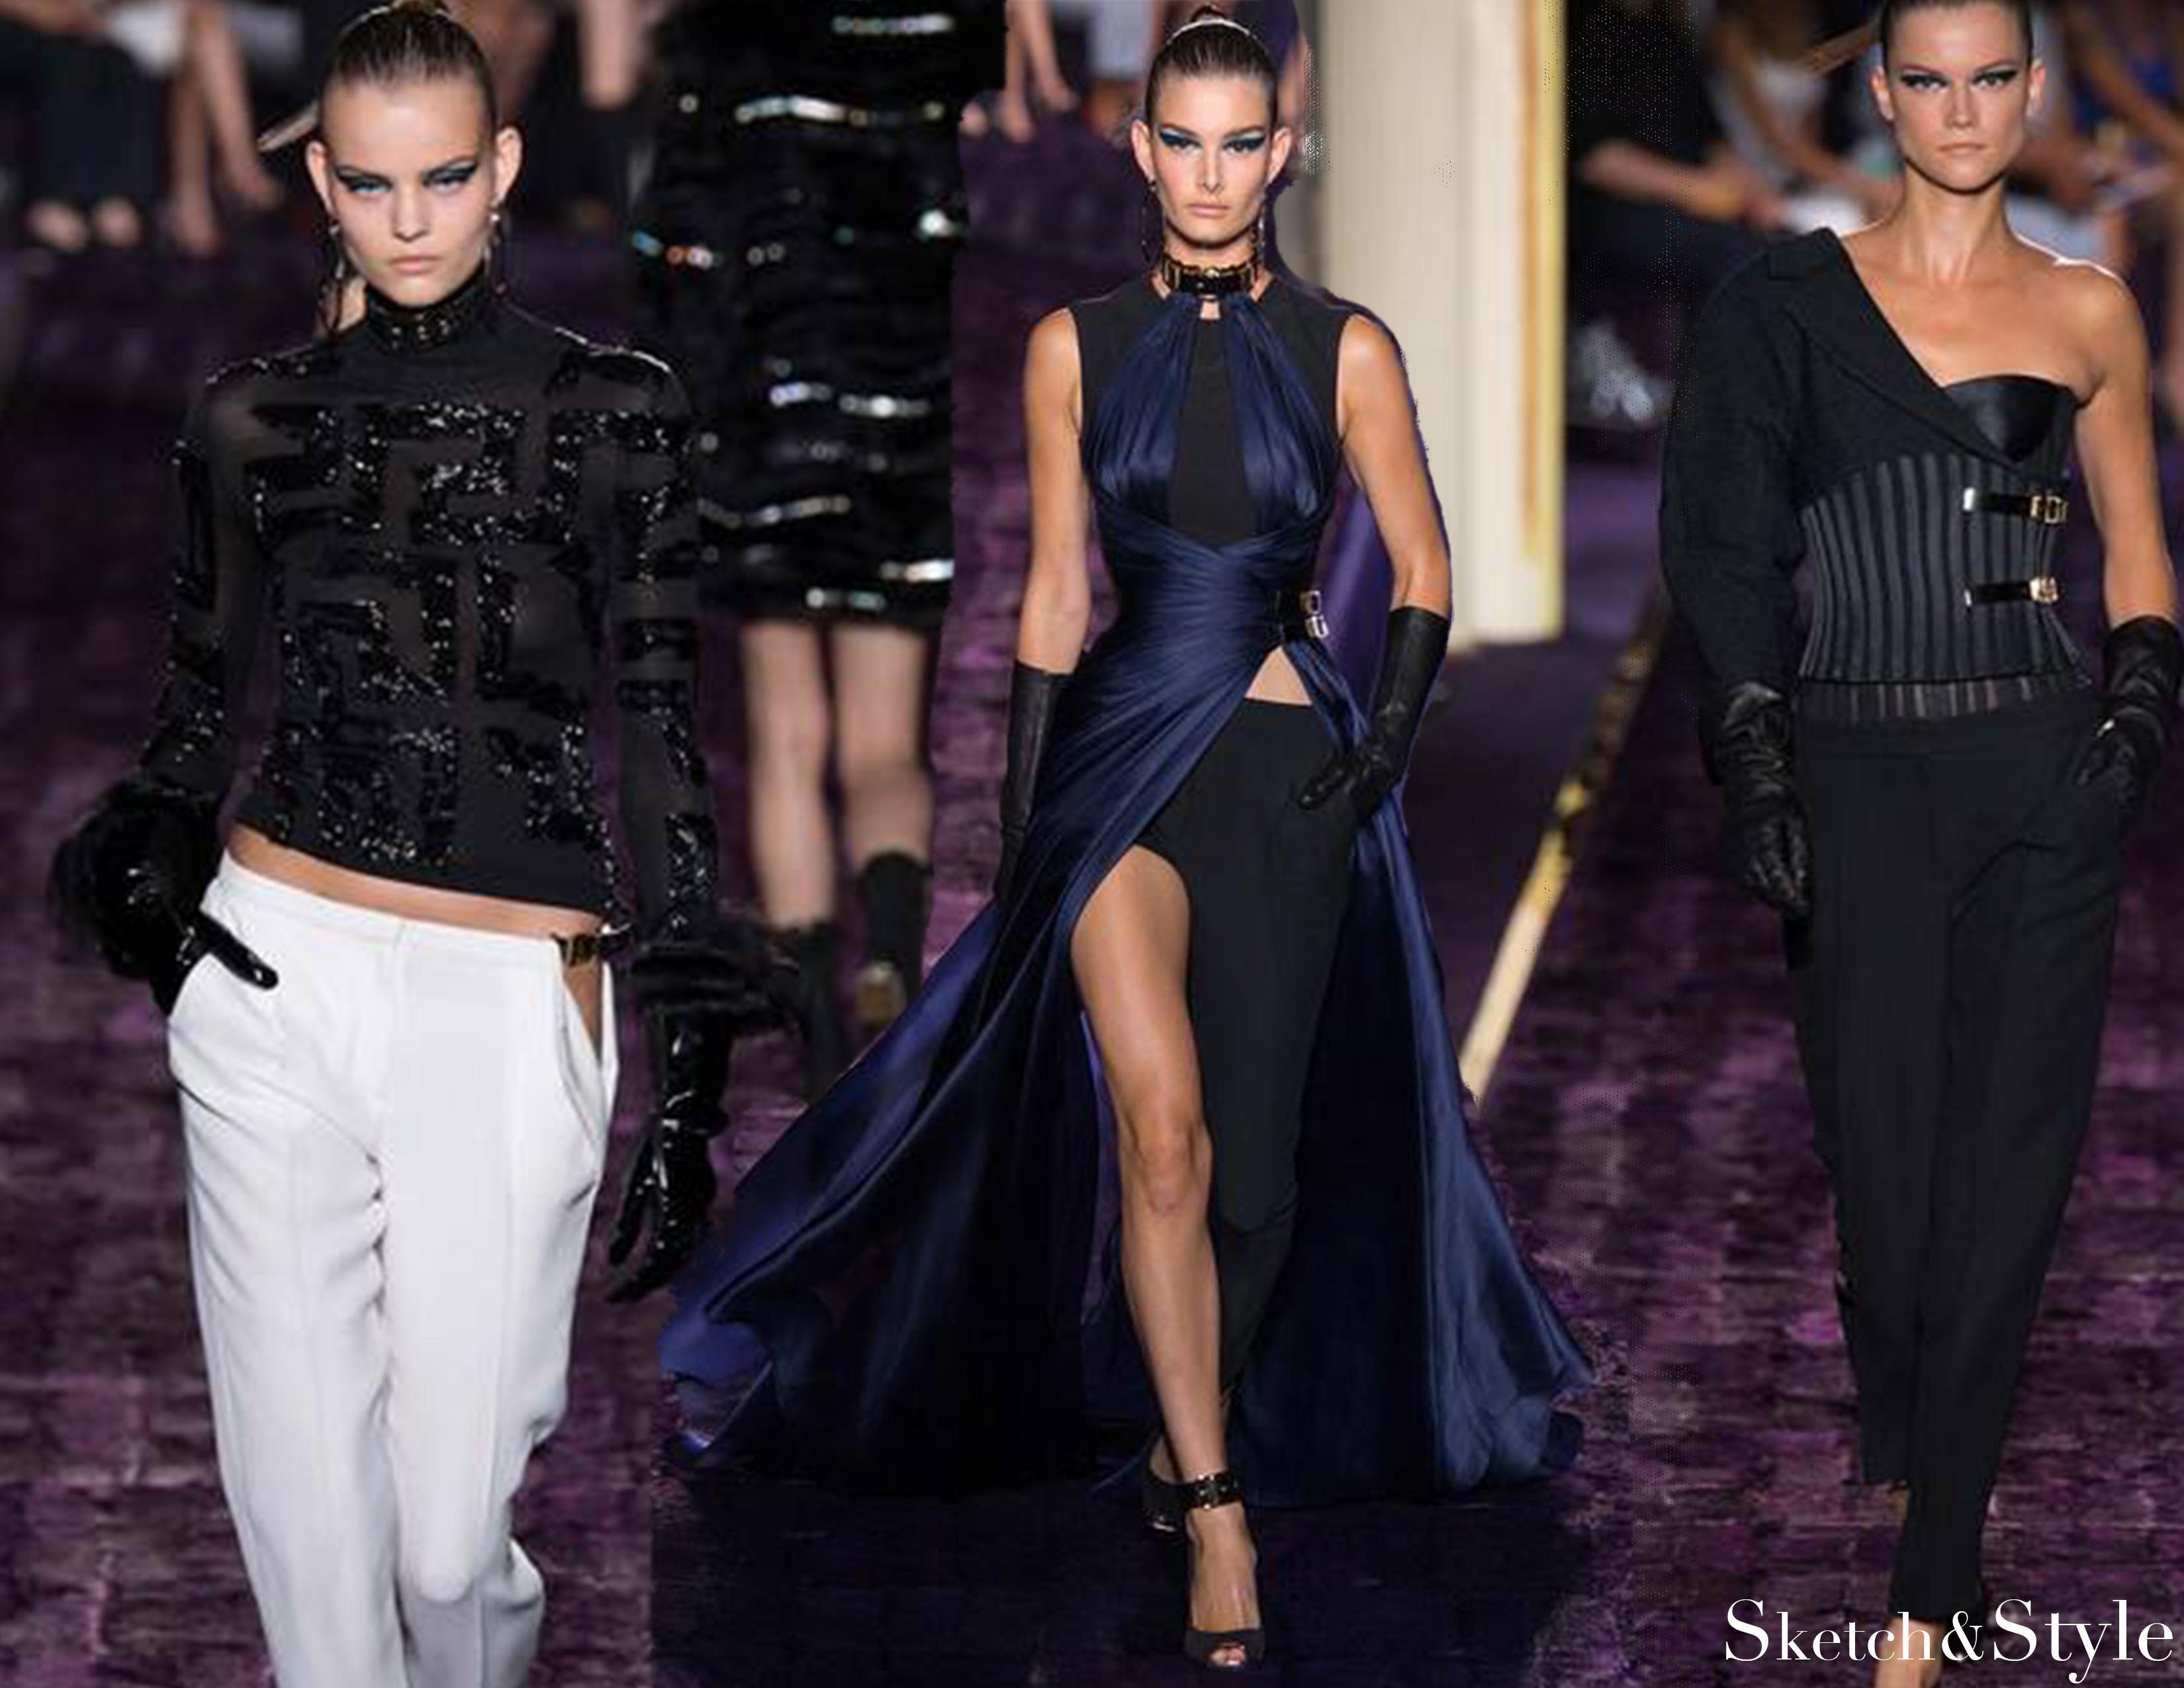 Atelier Versace Runway|Sketch&Style